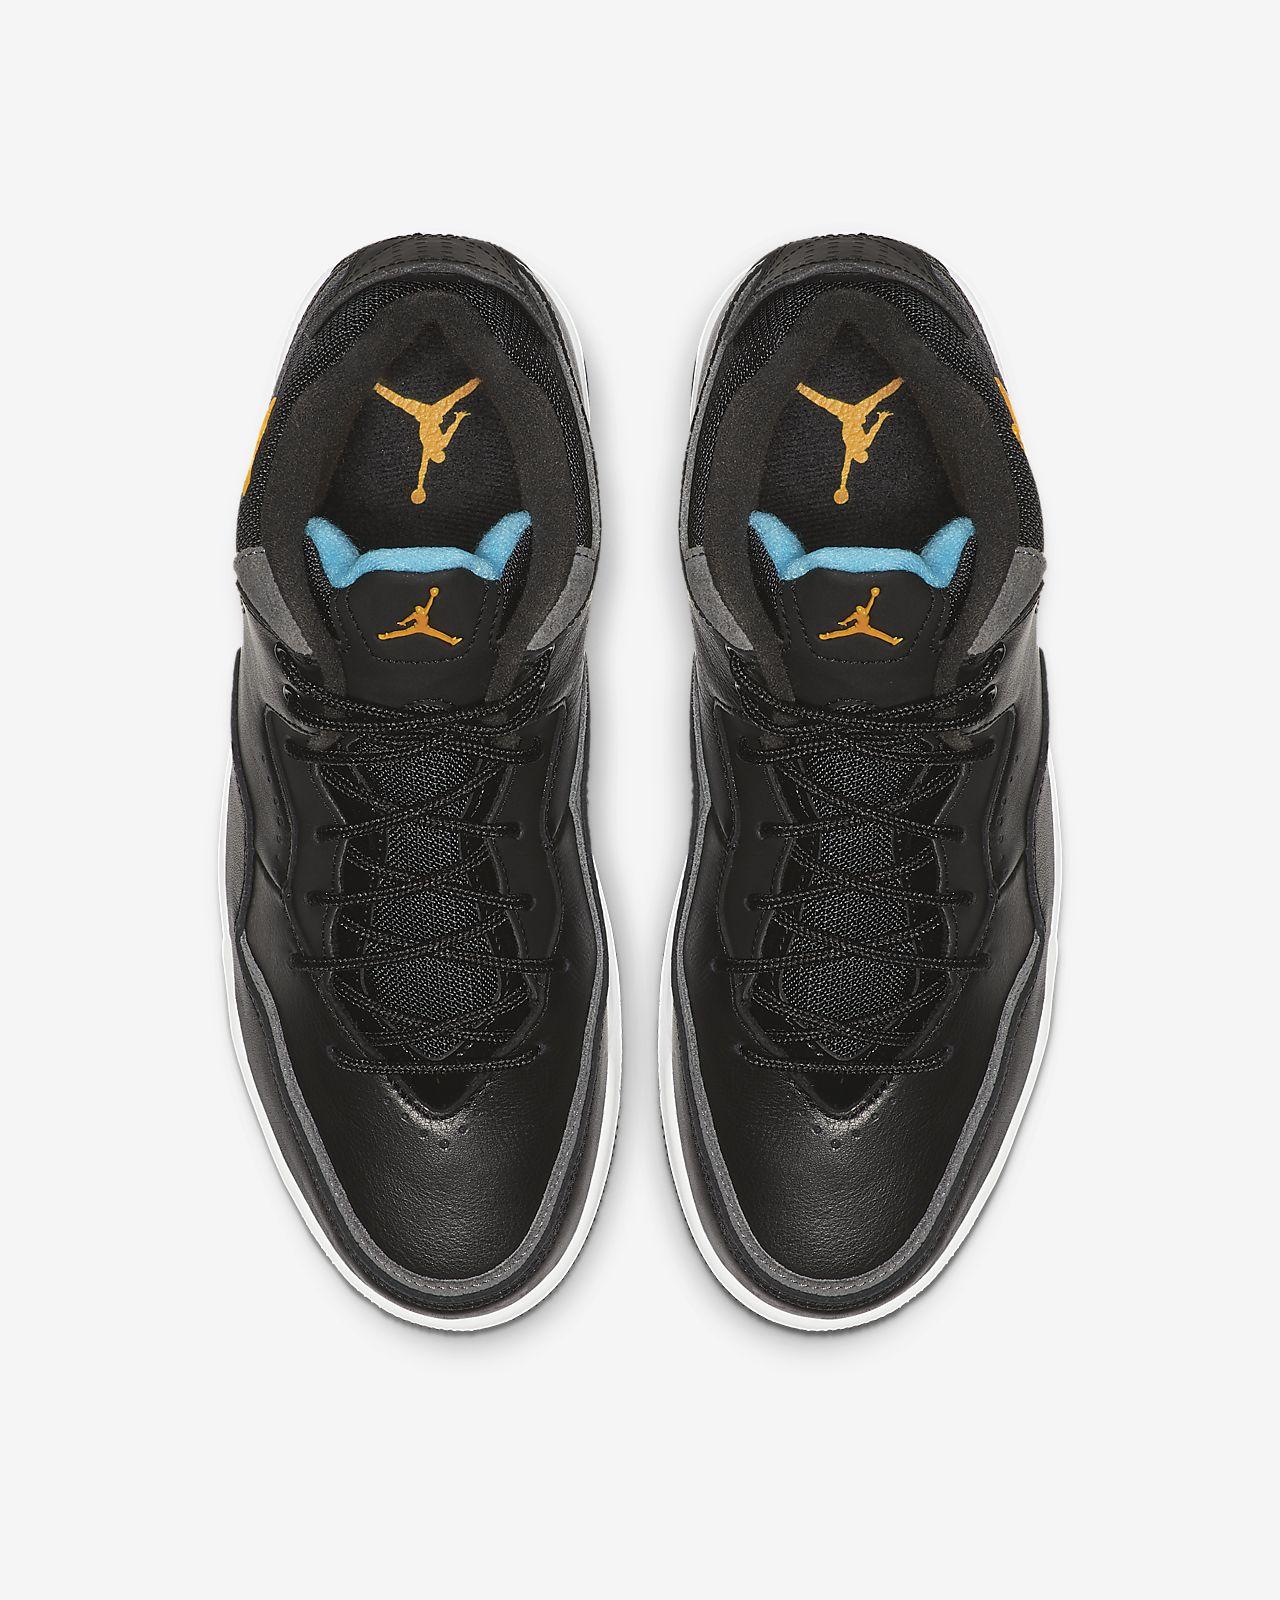 a24b9823c19307 Jordan Courtside 23 Men s Shoe. Nike.com CA